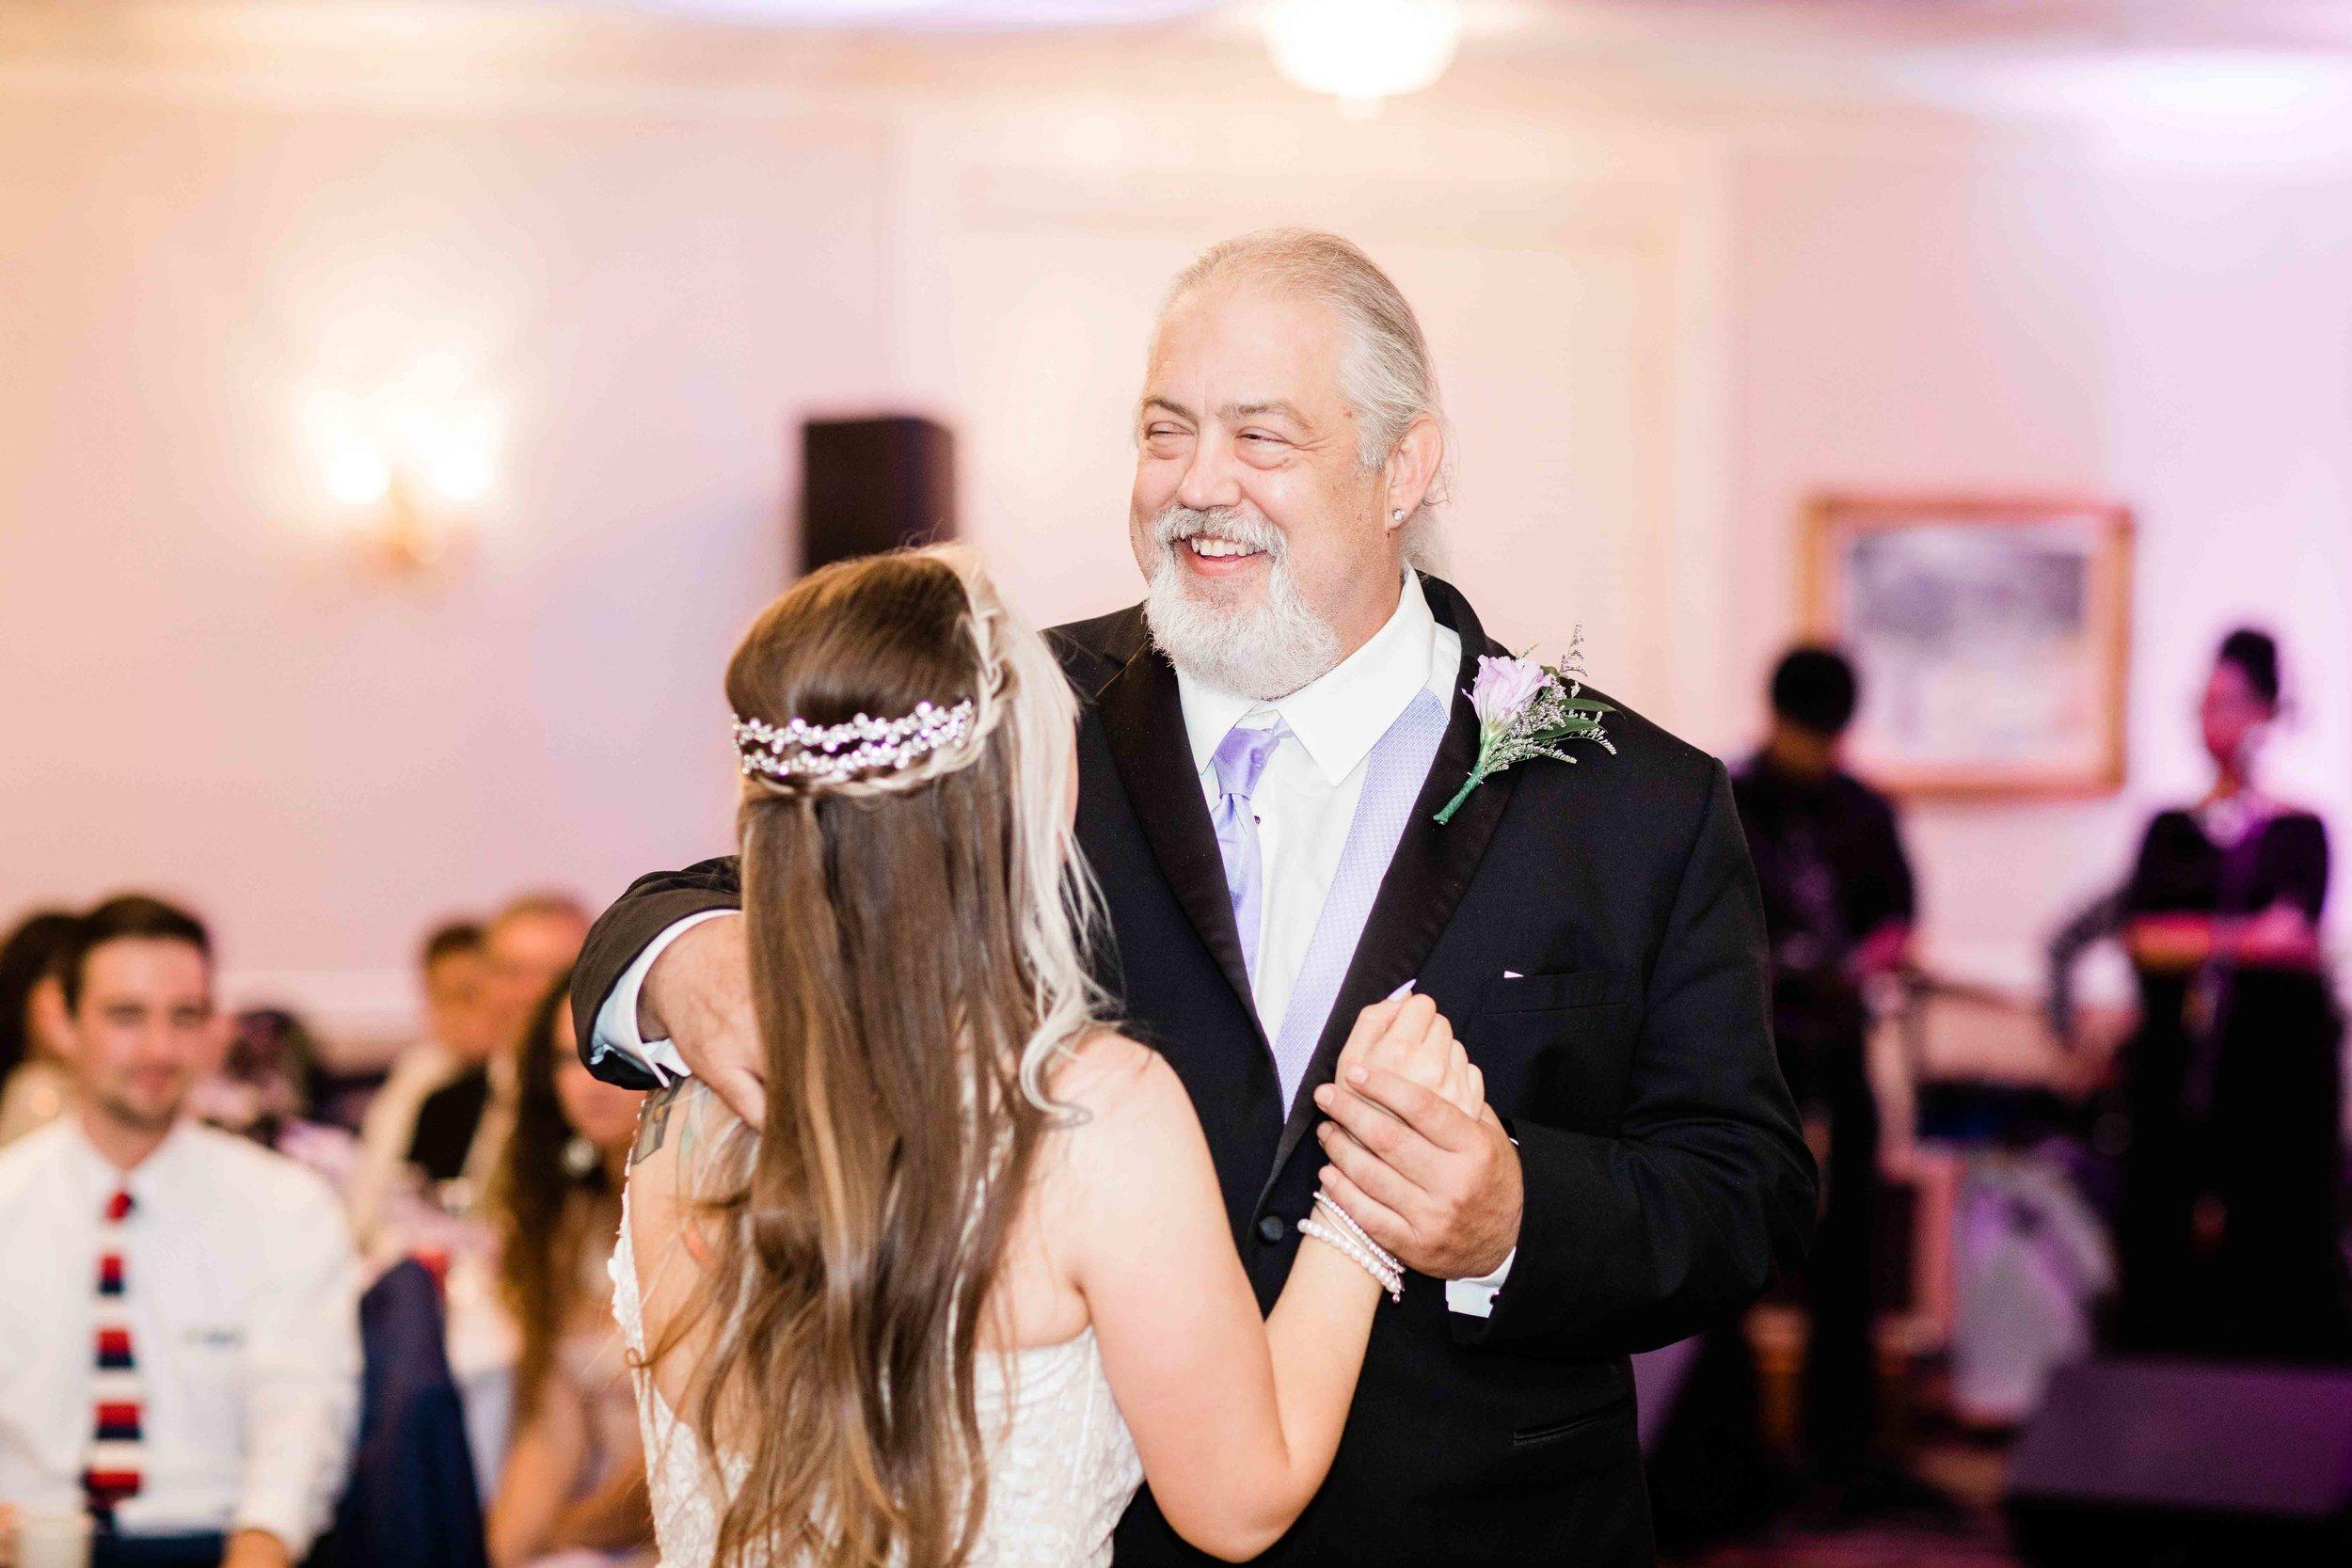 wedding reception photographers cincinnati dayton ohio-4.jpg